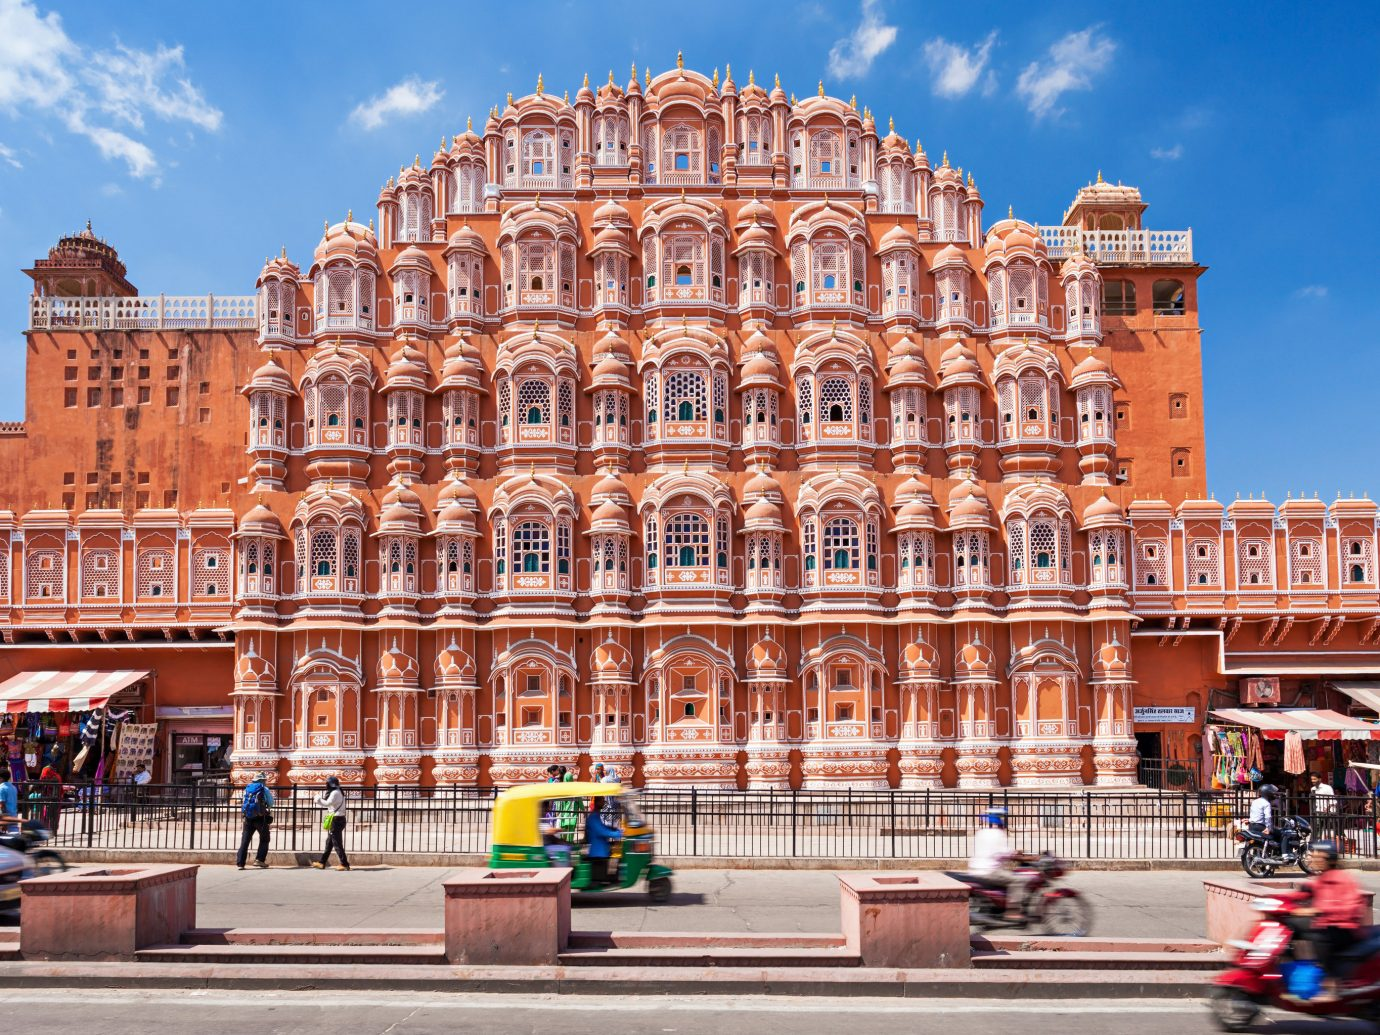 India Jaipur Jodhpur Trip Ideas landmark sky City palace plaza building urban area metropolis tourist attraction town square tourism metropolitan area ancient rome facade historic site Downtown classical architecture